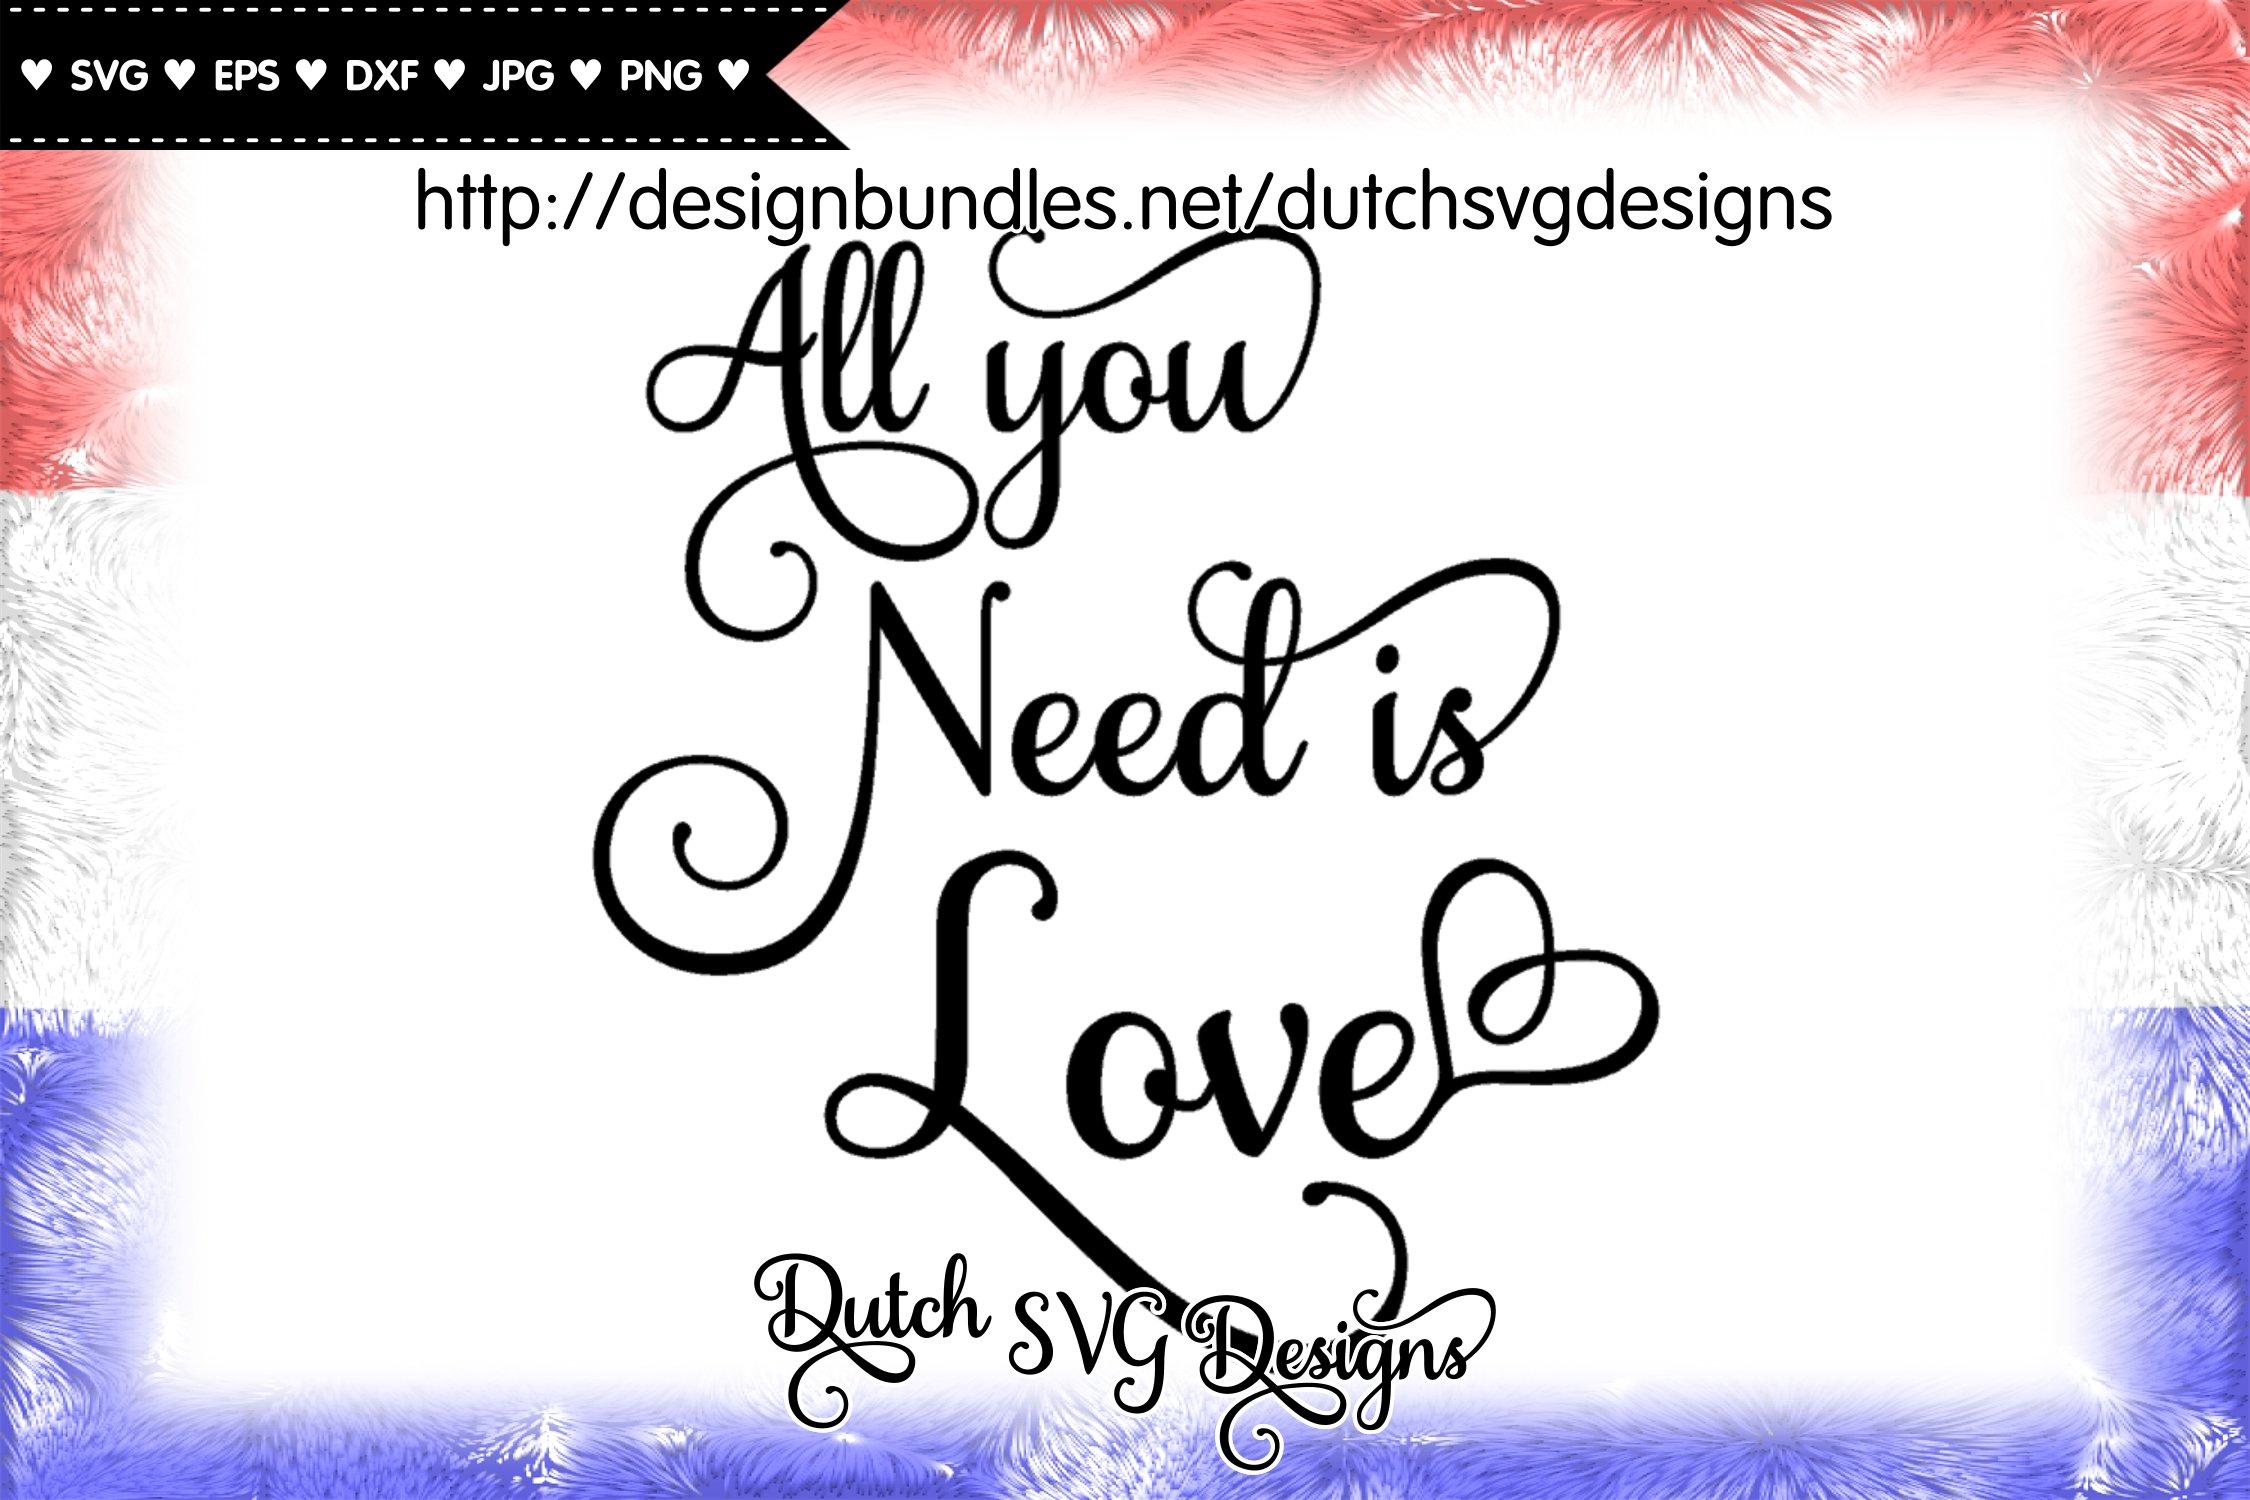 Download All You Need Is Love Svg, Valentine Svg, Love Svg Image